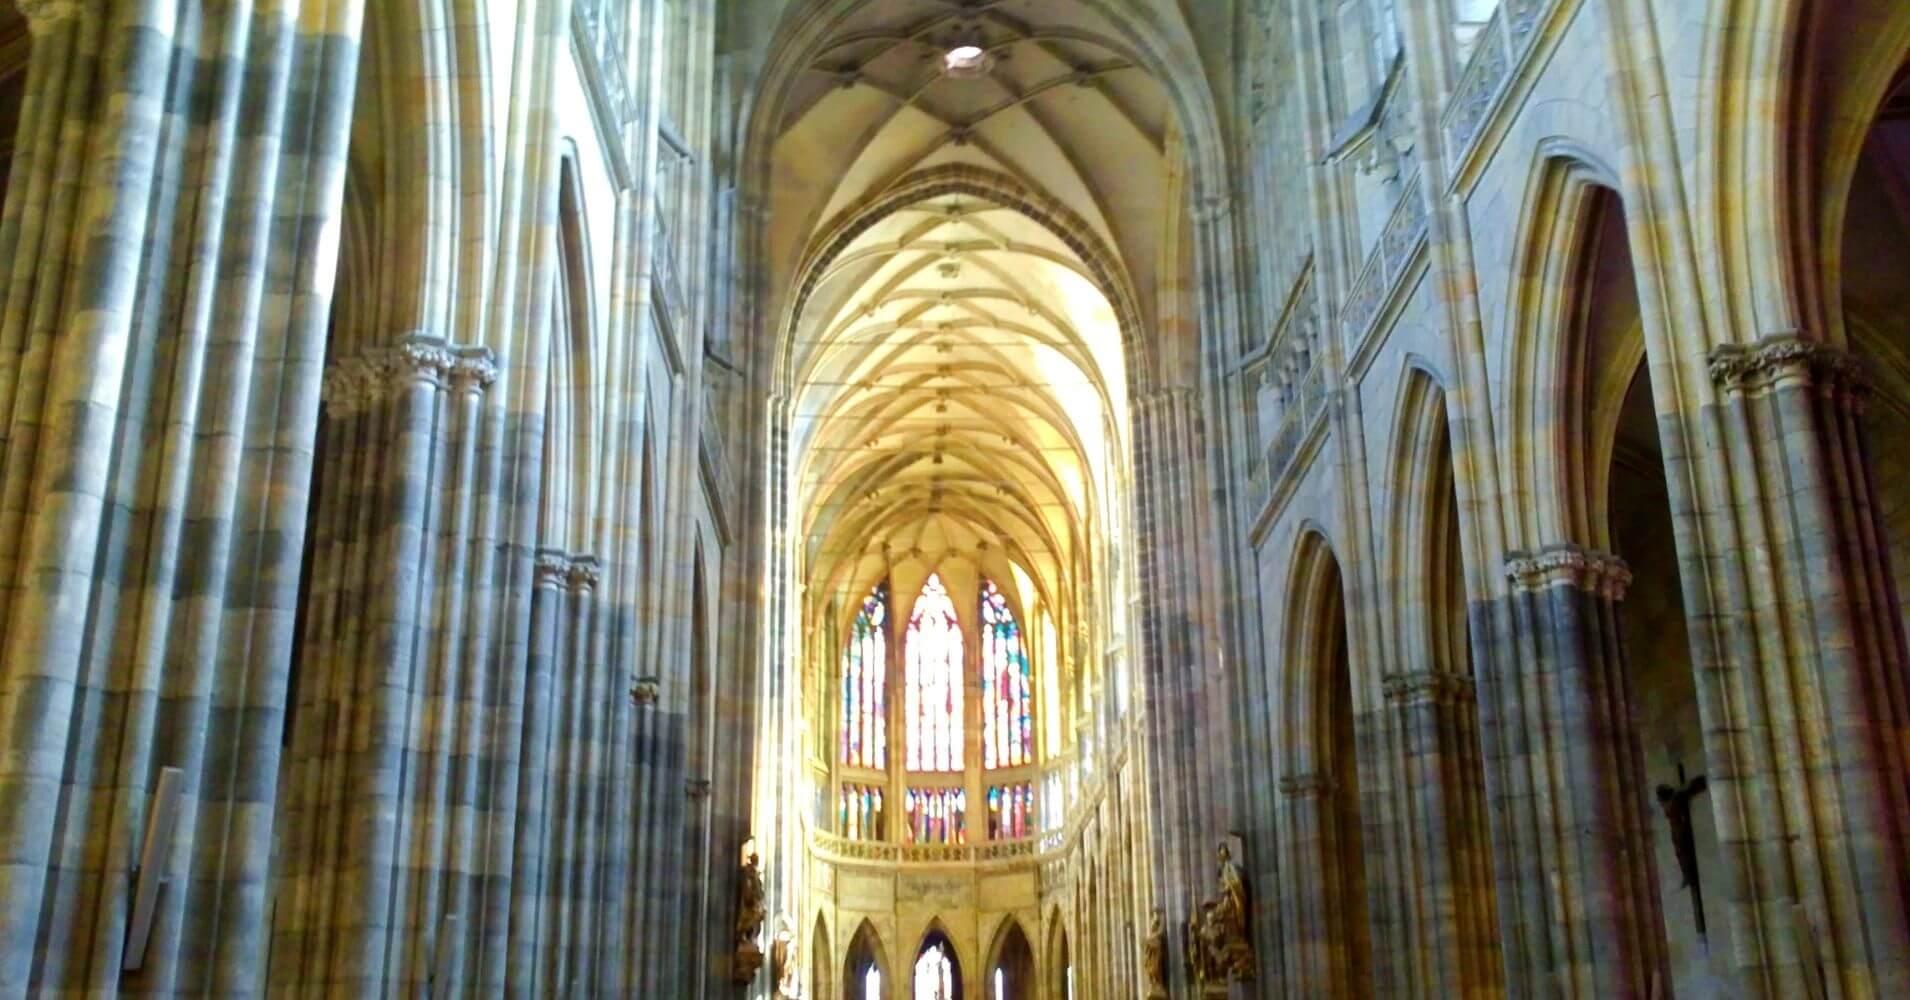 Catedral de Praga Capital de Bohemia. República Checa.